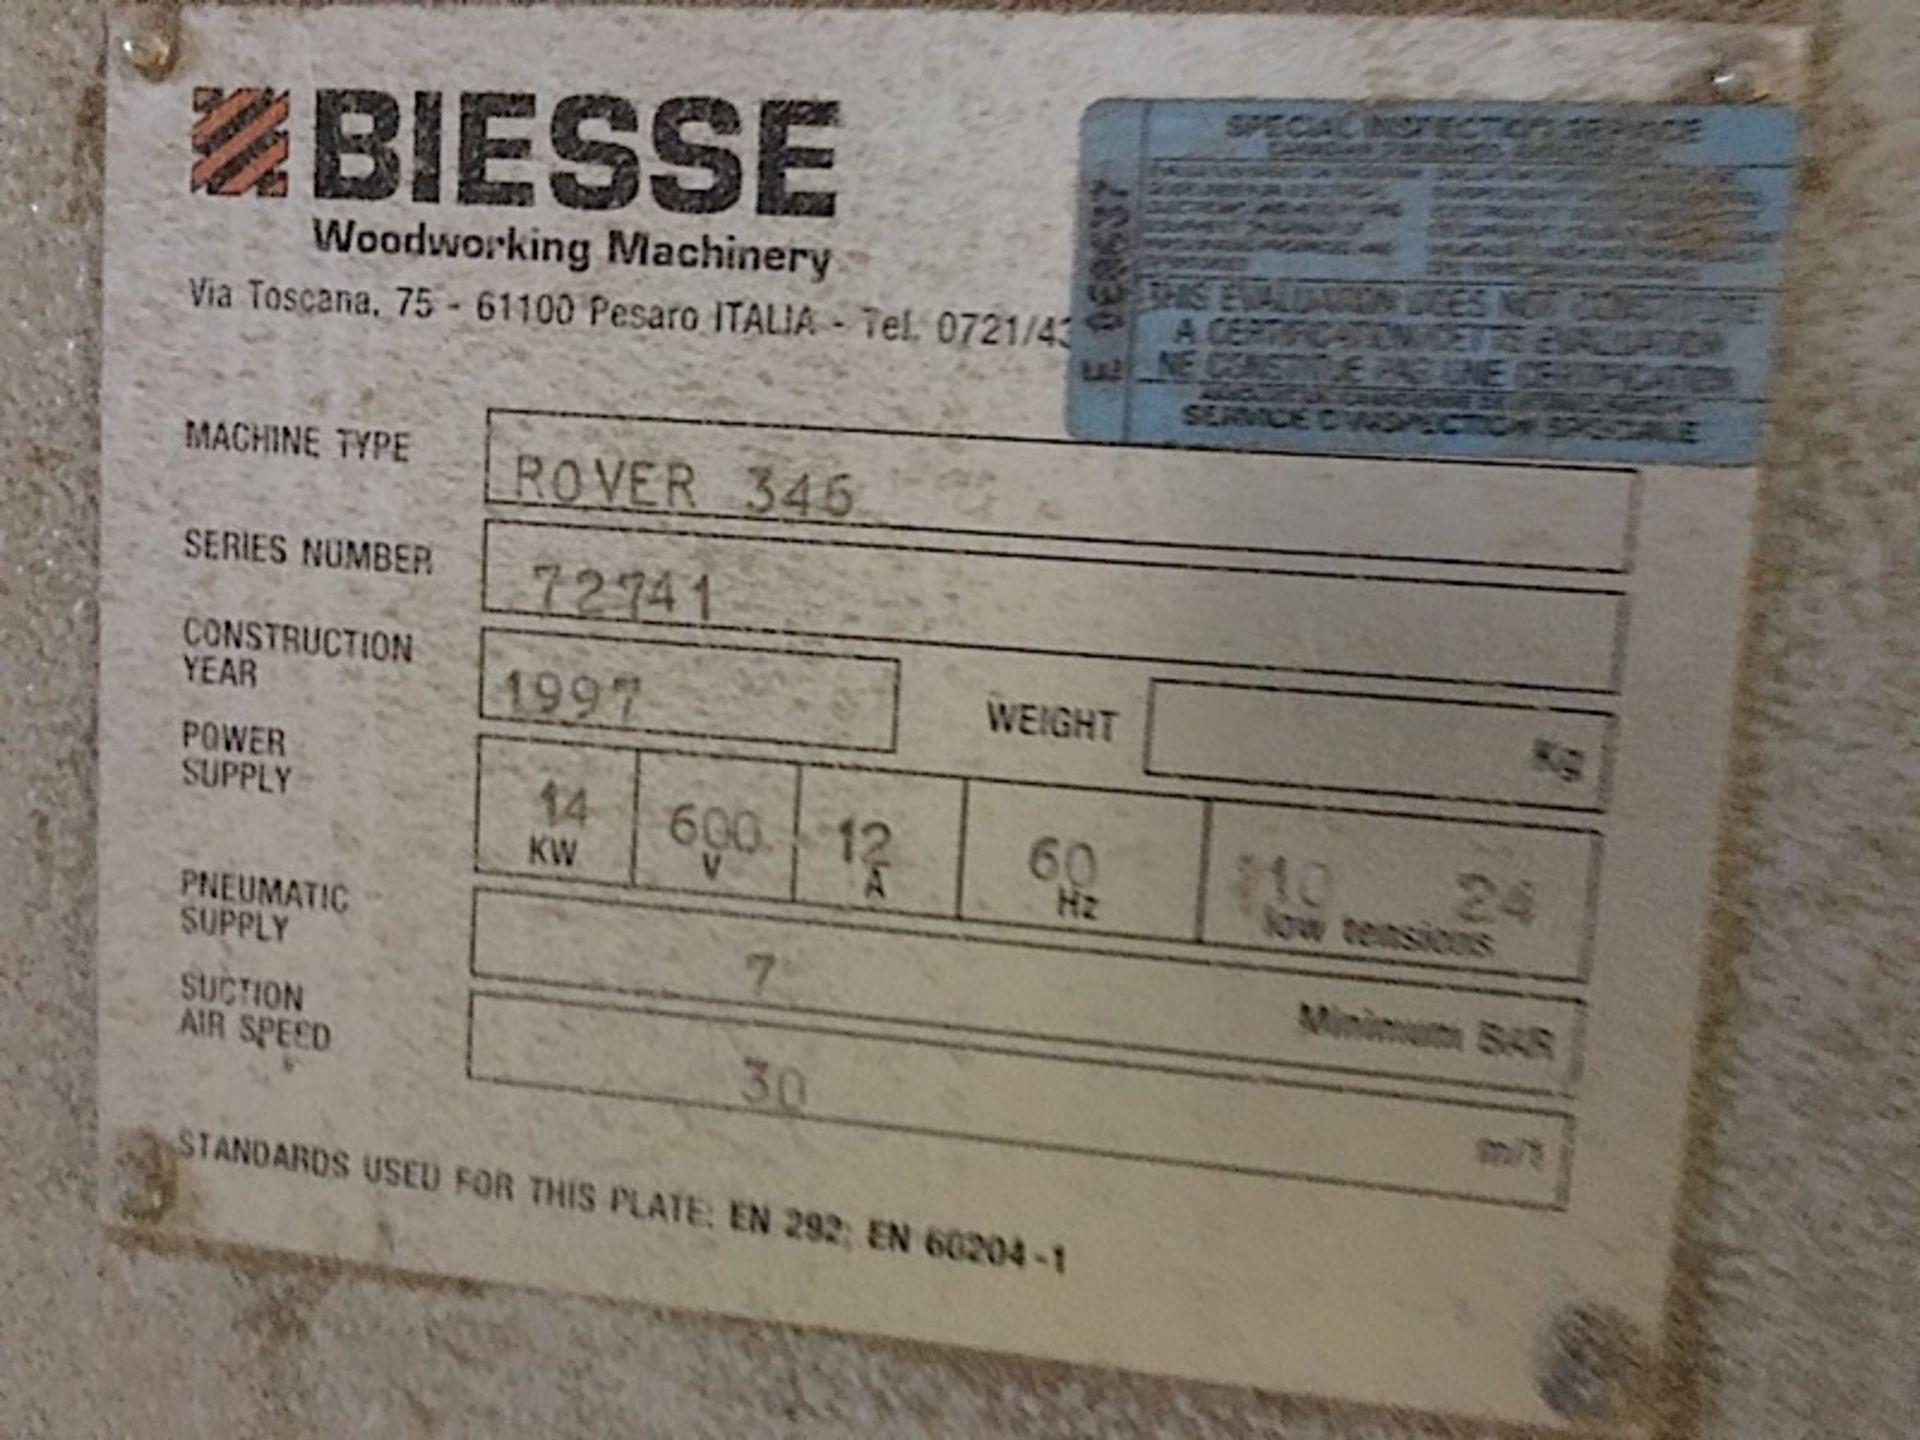 BIESSE (346) CNC POD & RAIL ROUTER - Image 4 of 4